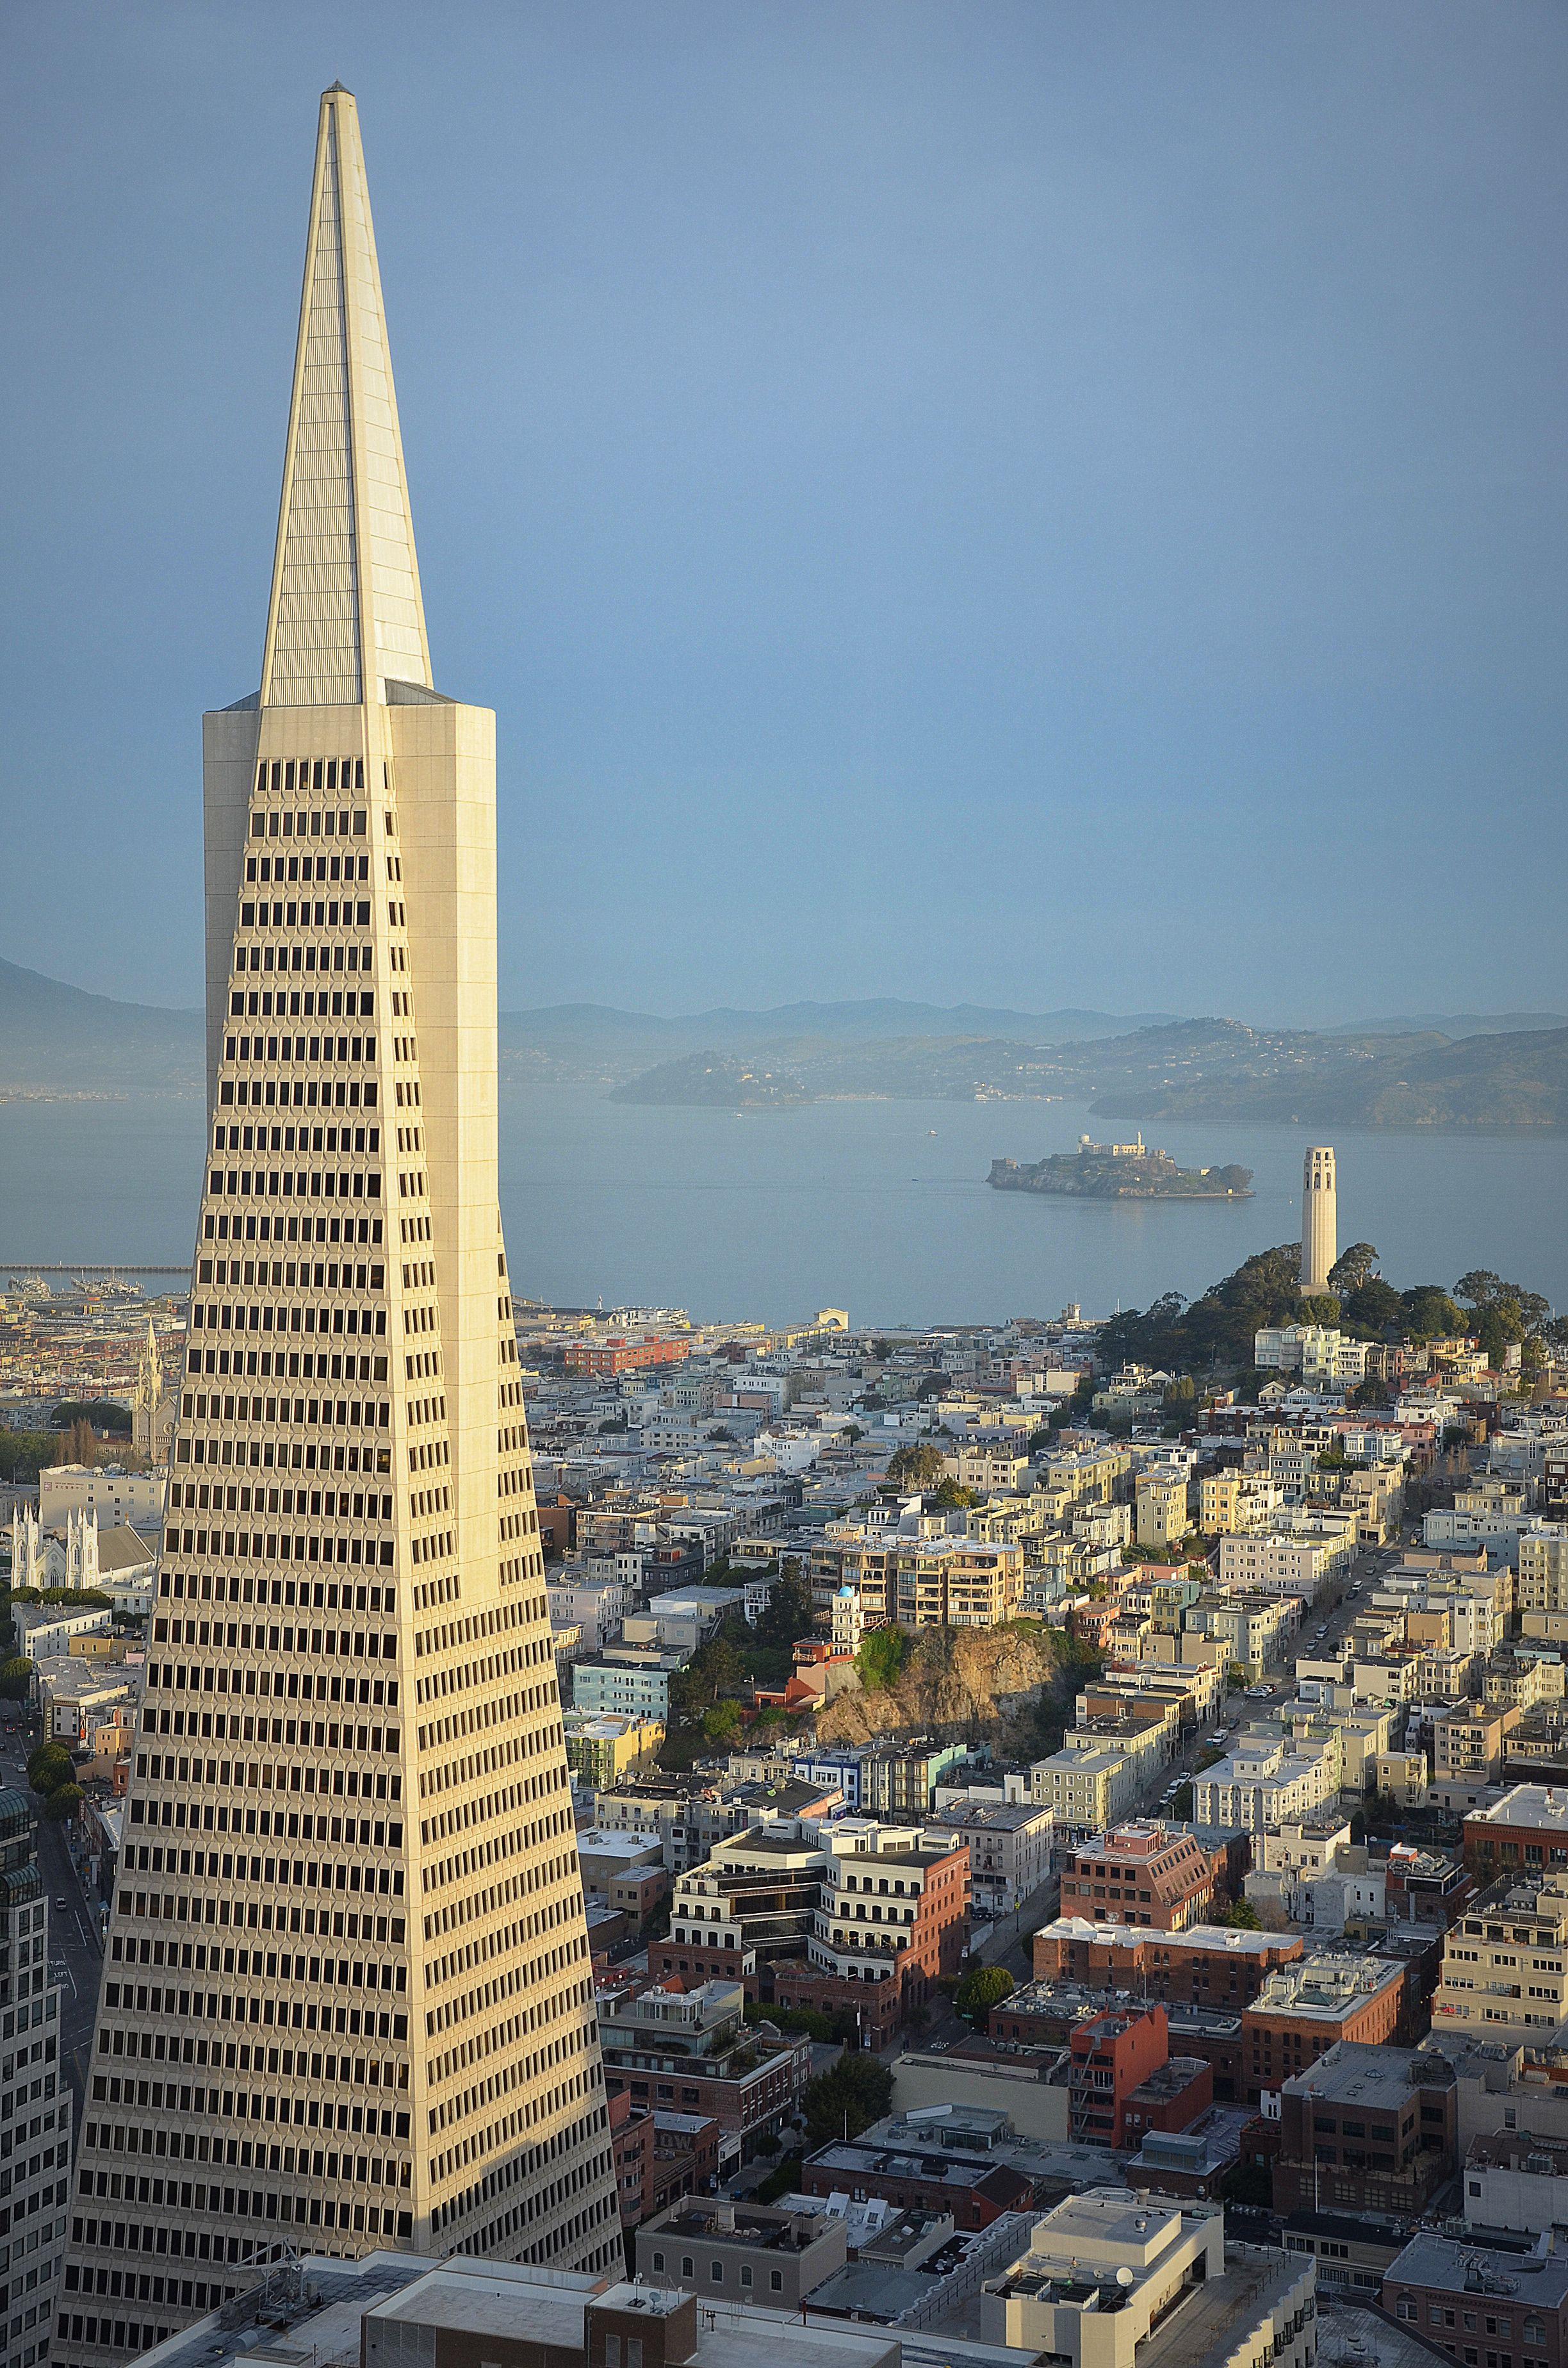 San Francisco, Transamerica building